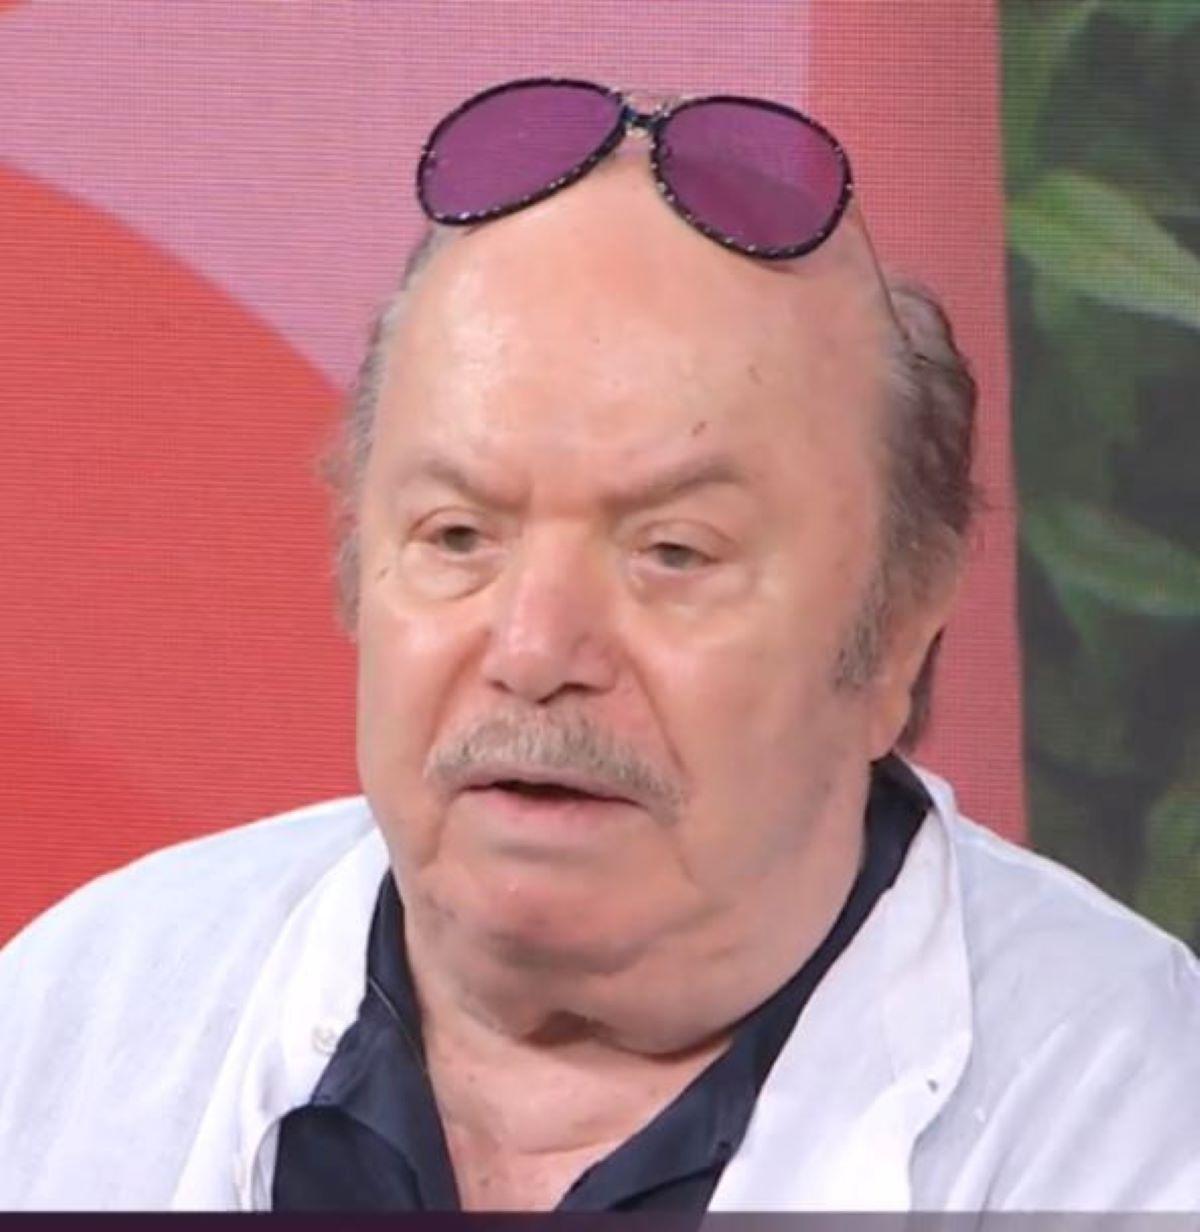 Lino Banfi Censura Spot TimVision Vogarità Porca Puttena